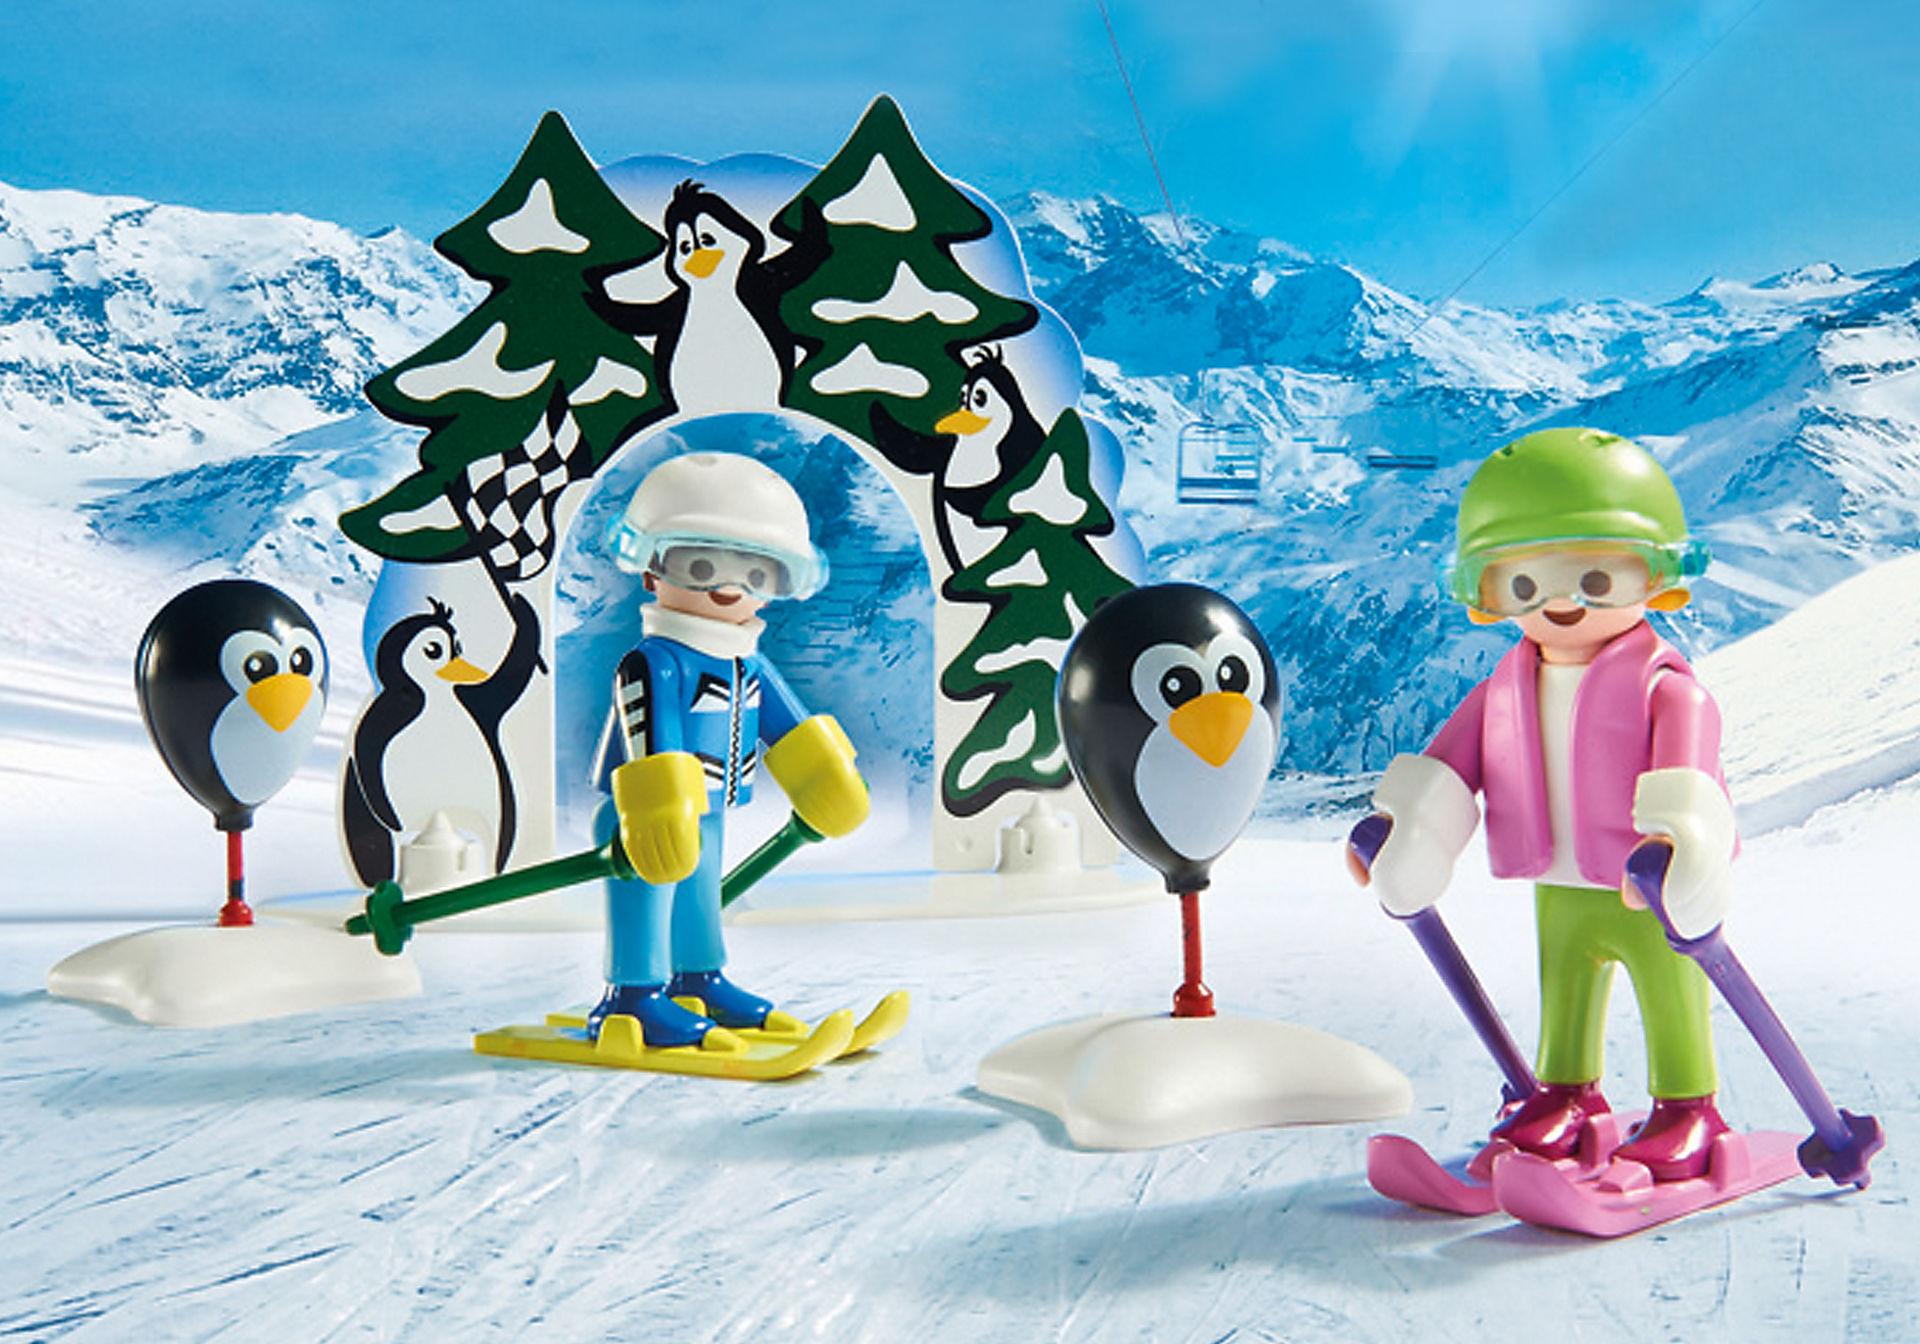 http://media.playmobil.com/i/playmobil/9282_product_extra1/Moniteur de ski avec enfants